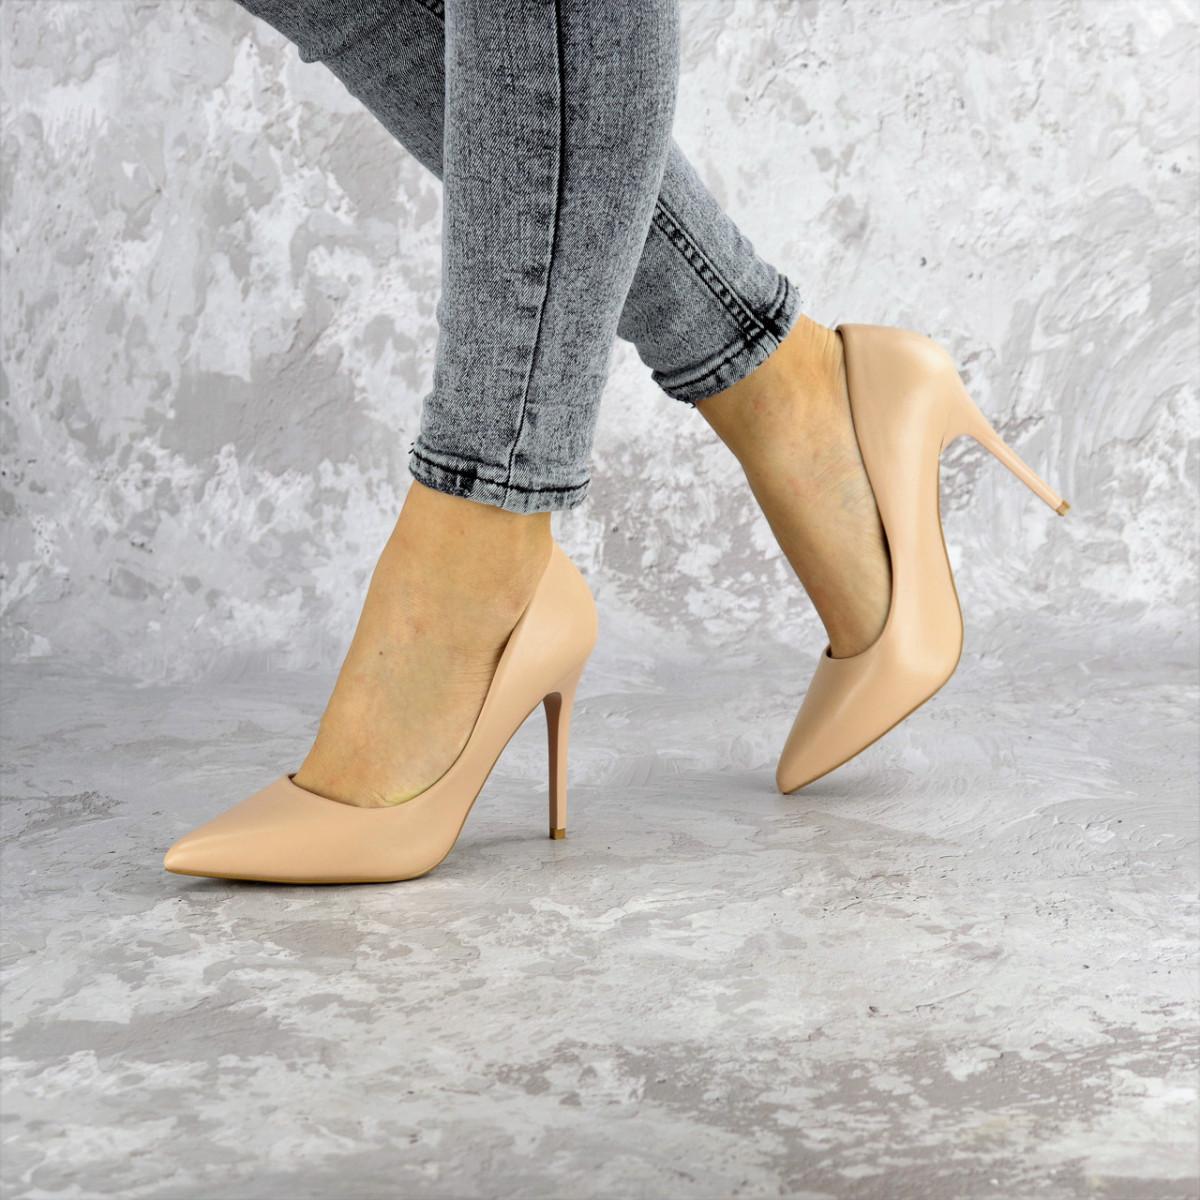 Туфли женские на каблуке бежевые Fleetwood 2367 (36 размер)